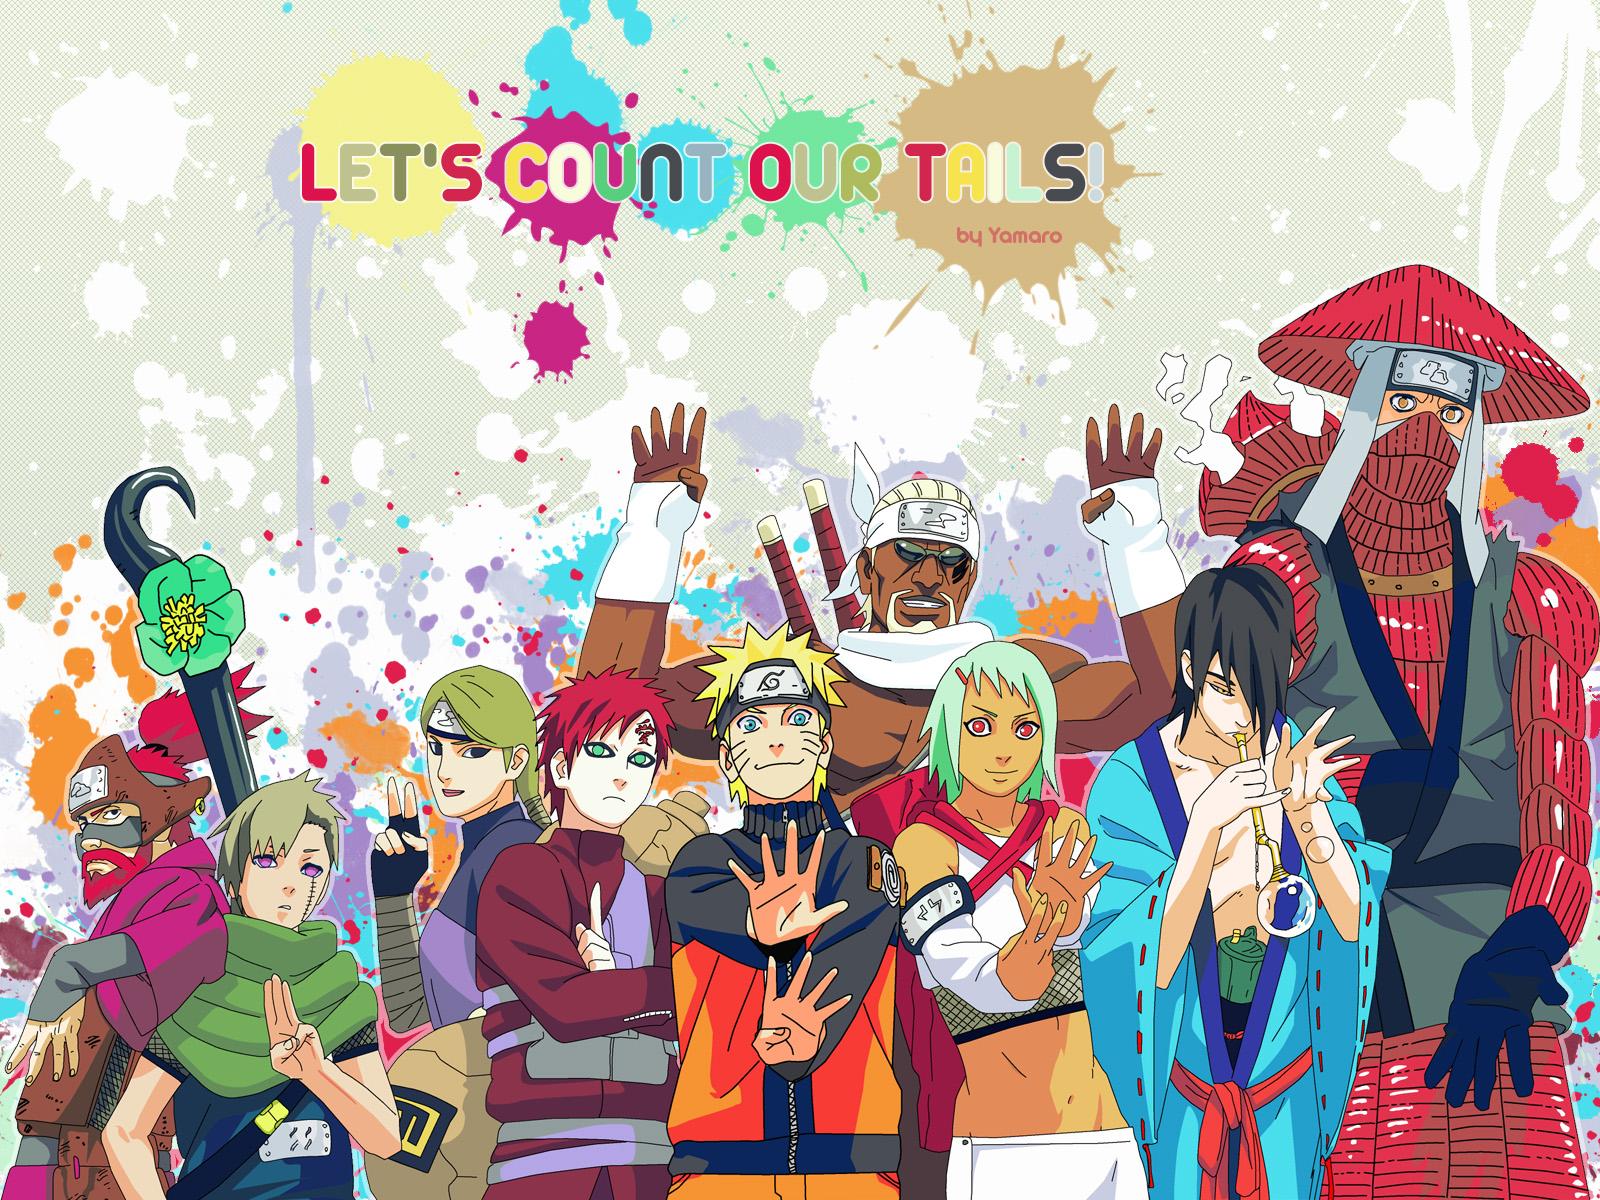 jinchuuriki - naruto - wallpaper #991206 - zerochan anime image board